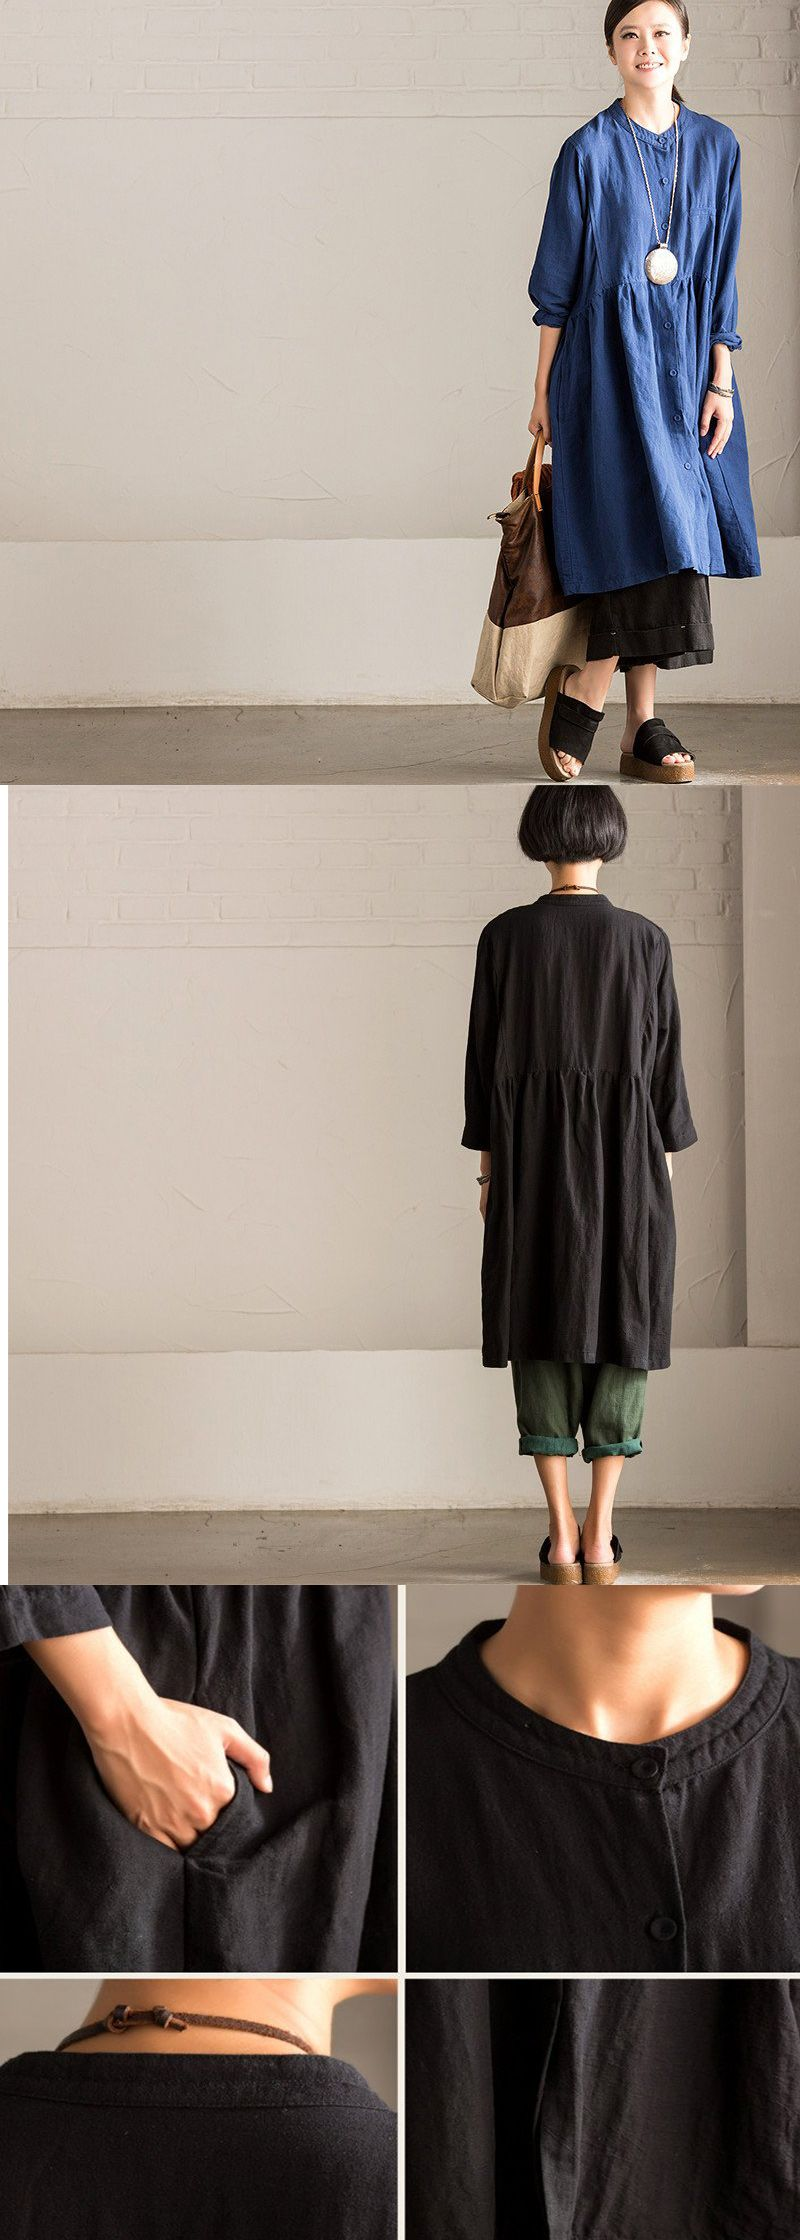 Retro cotton linen loose dress.Bohemian style for buykud dresses